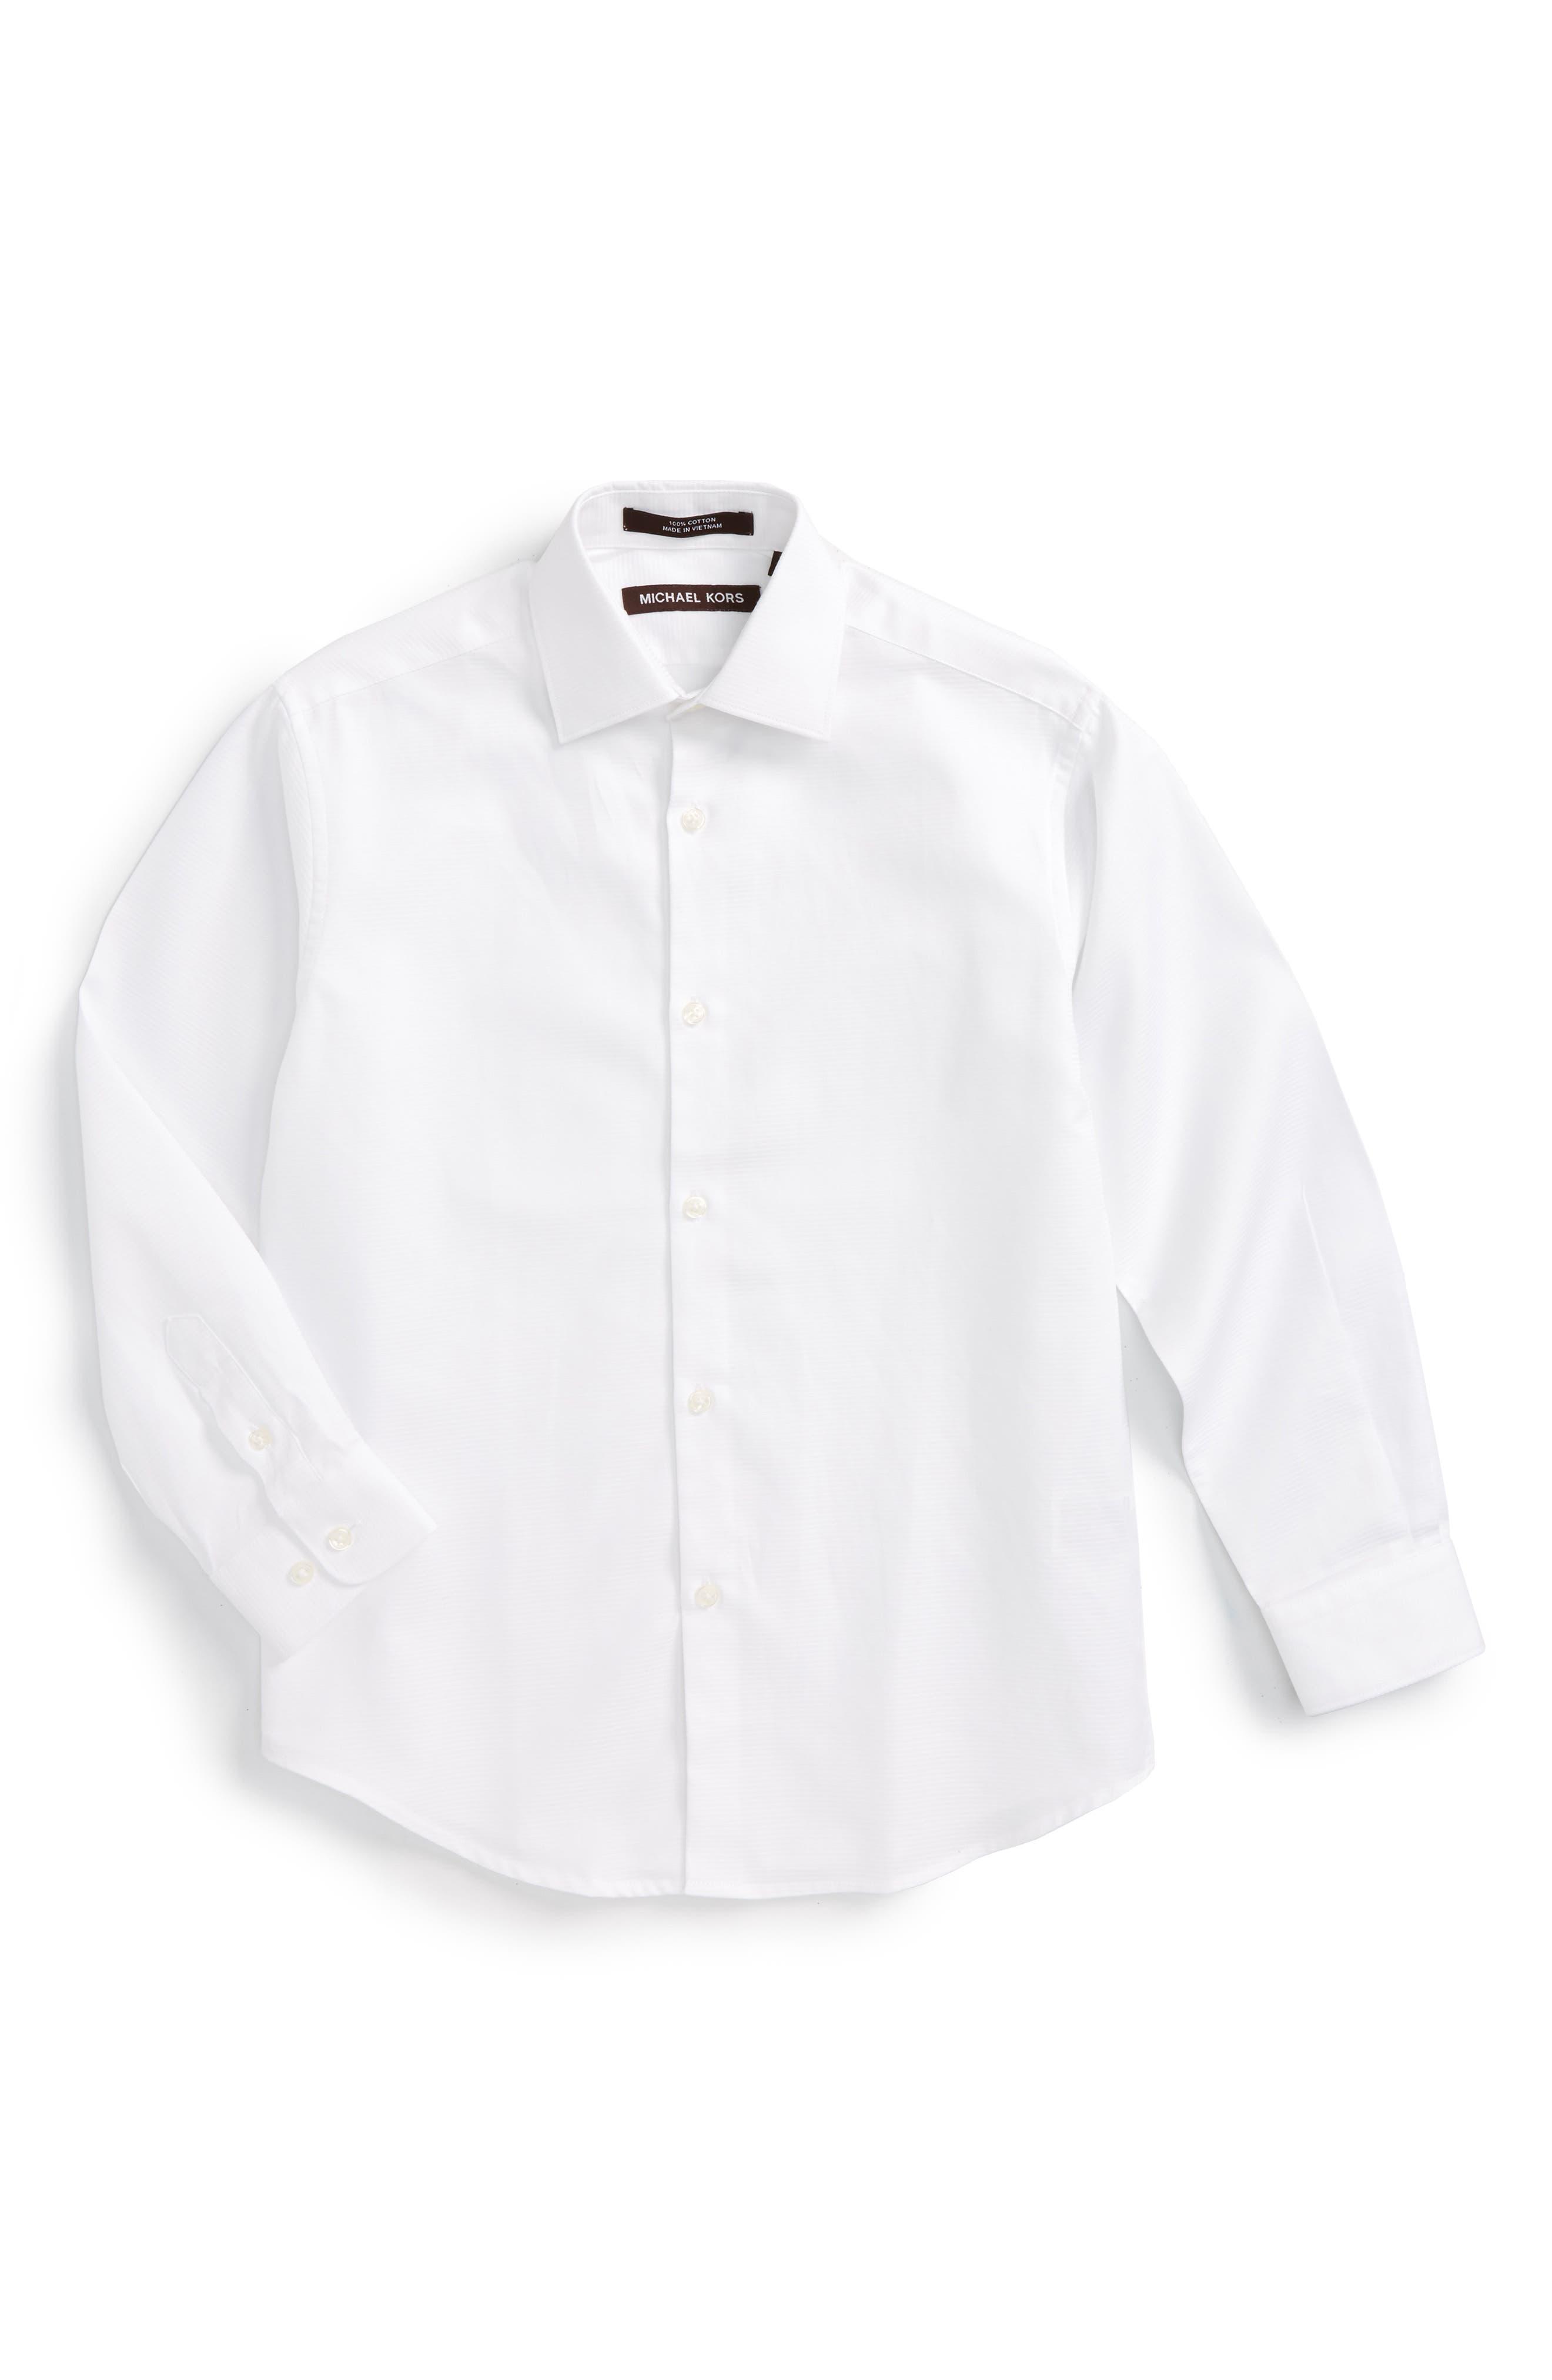 MICHAEL KORS Solid Dress Shirt, Main, color, WHITE